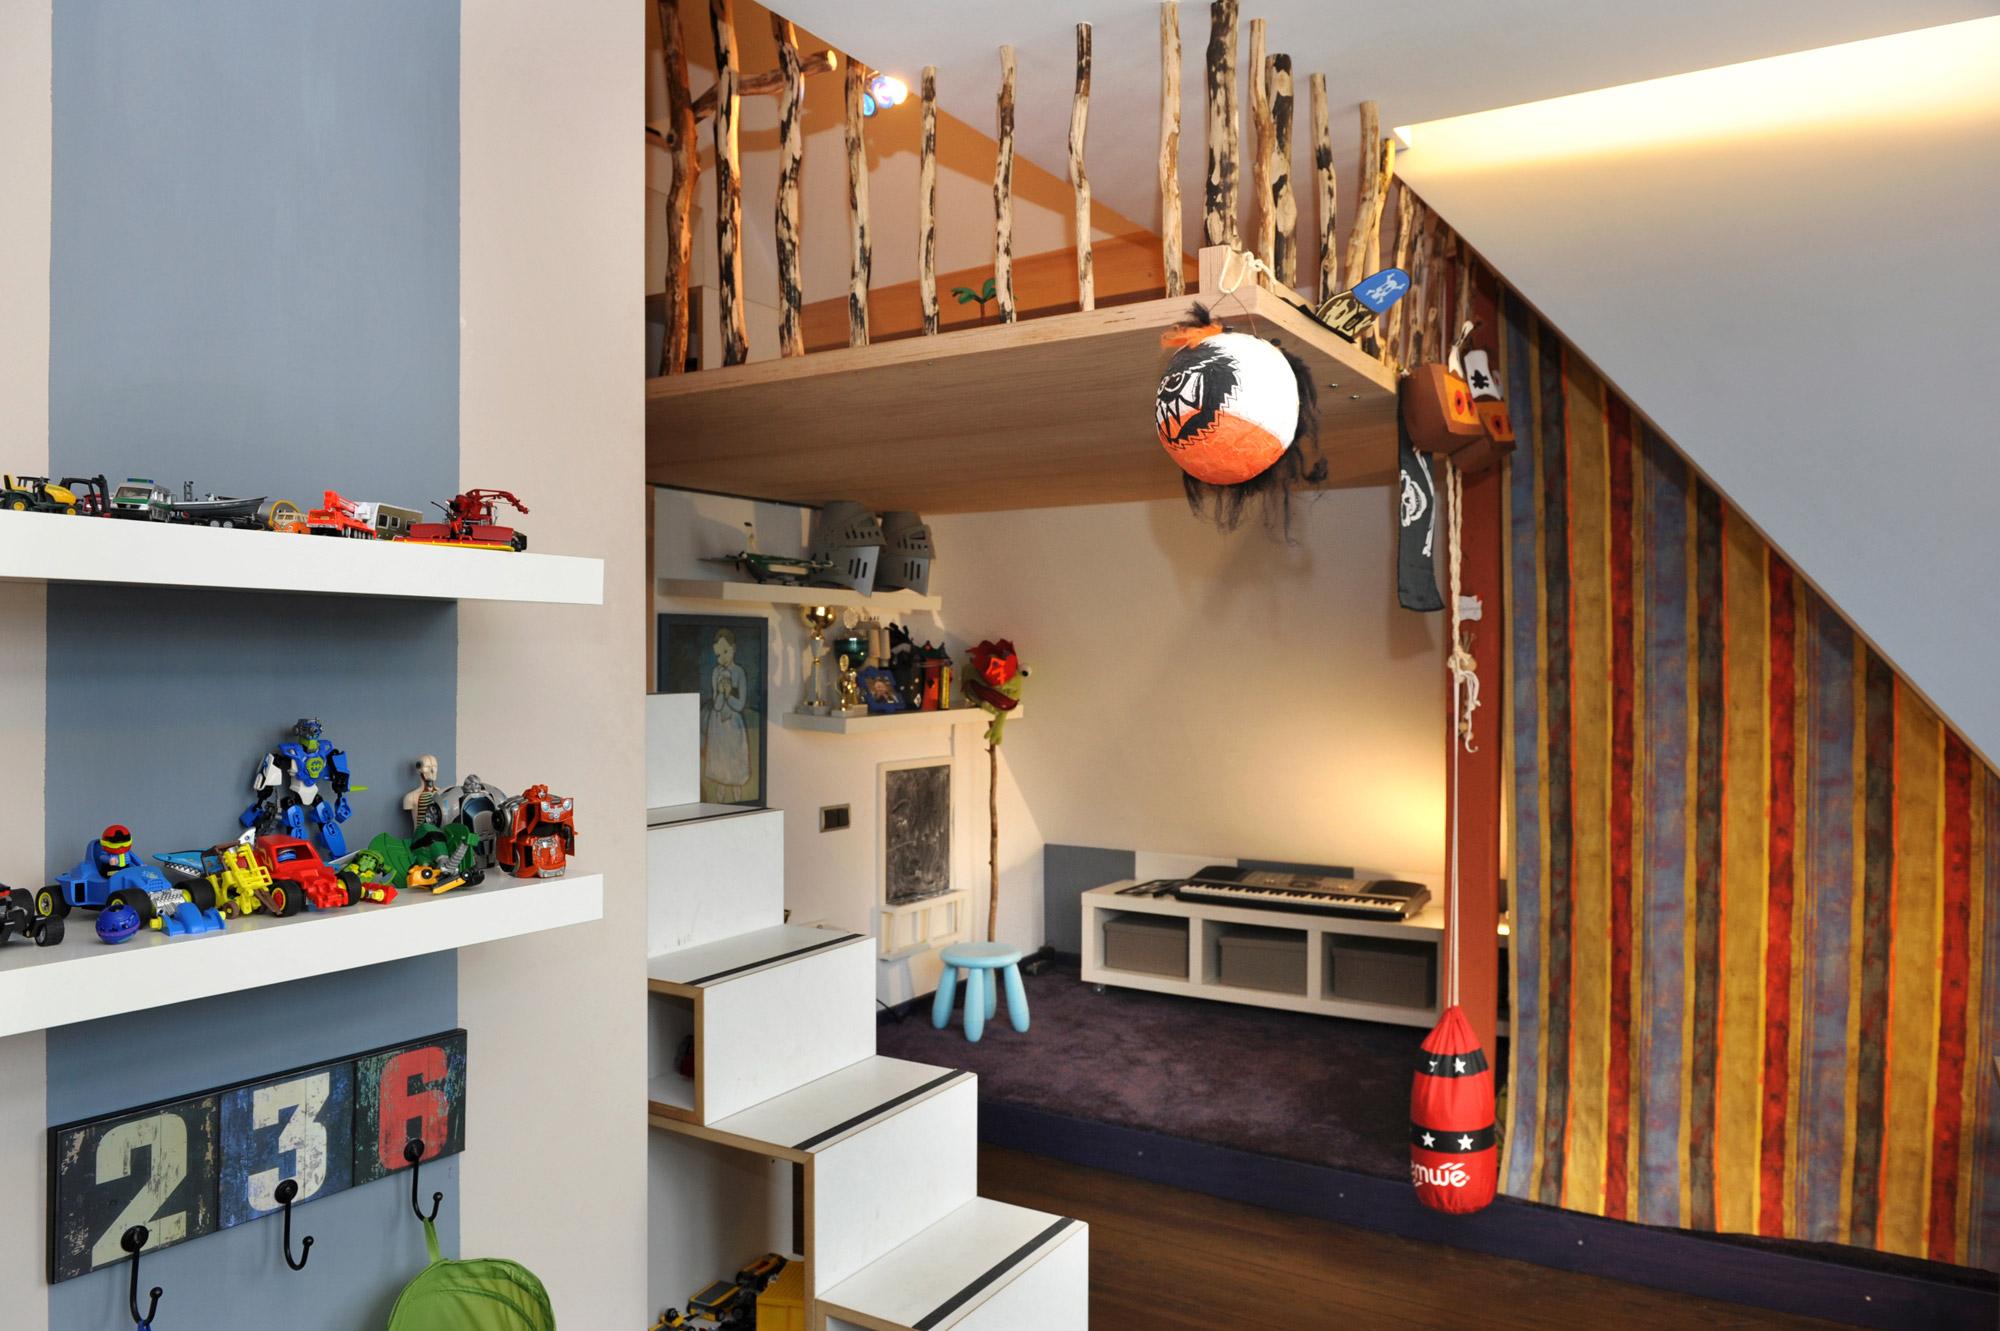 Altbau Kinderzimmer